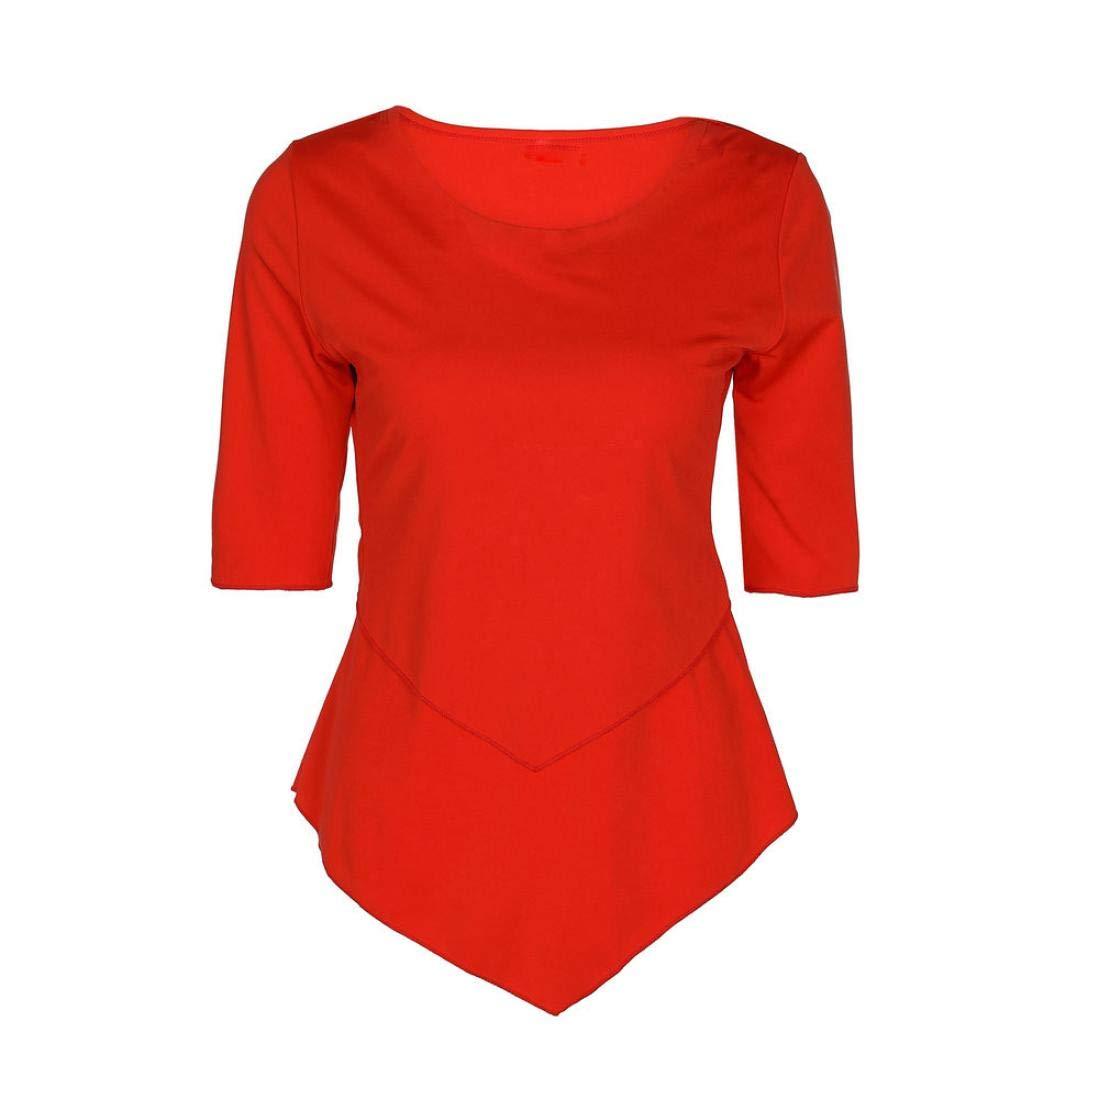 Damen Tops Bluse Langarm SUNNSEAN Frauen Langarmshirts Unregelmäßig T-Shirt Bluse Oberteile Hemd Sweatshirt Lässige Streetwear Lose Pullover Tops Tuniken